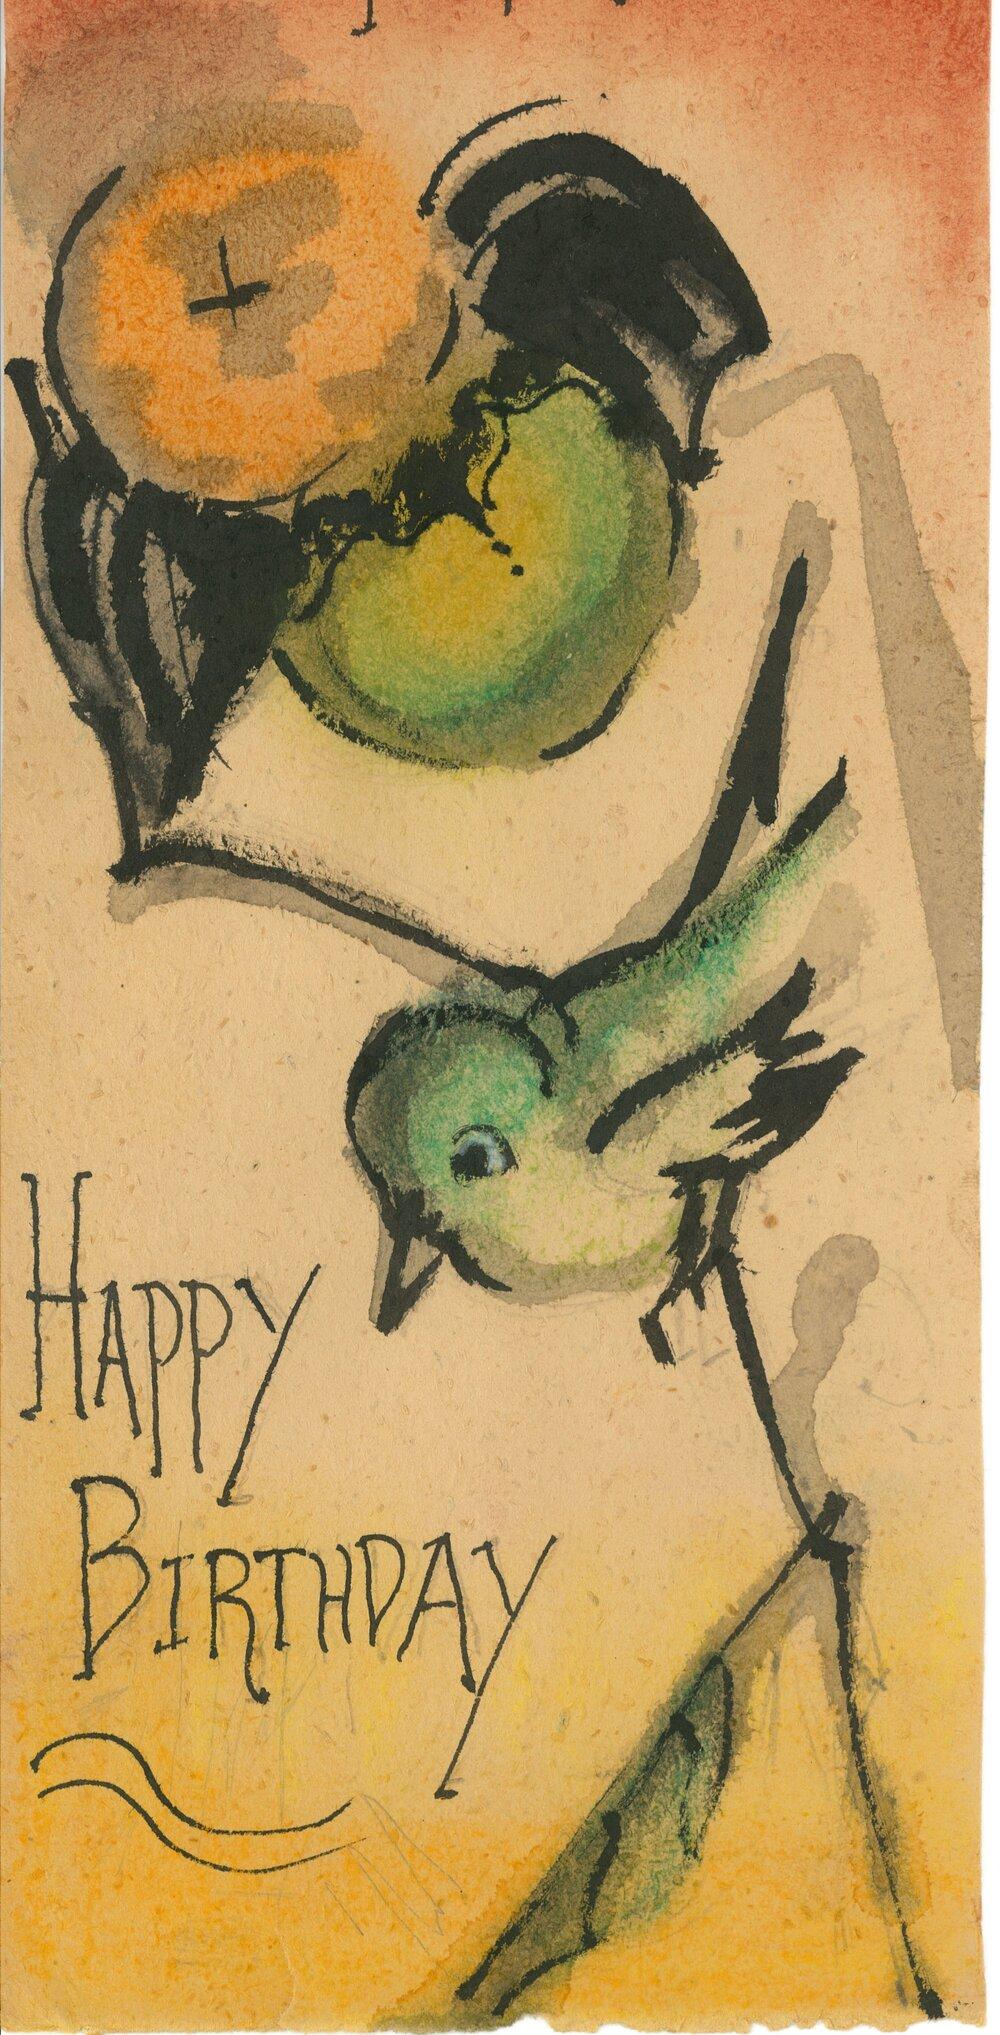 Birthday card small file.jpg